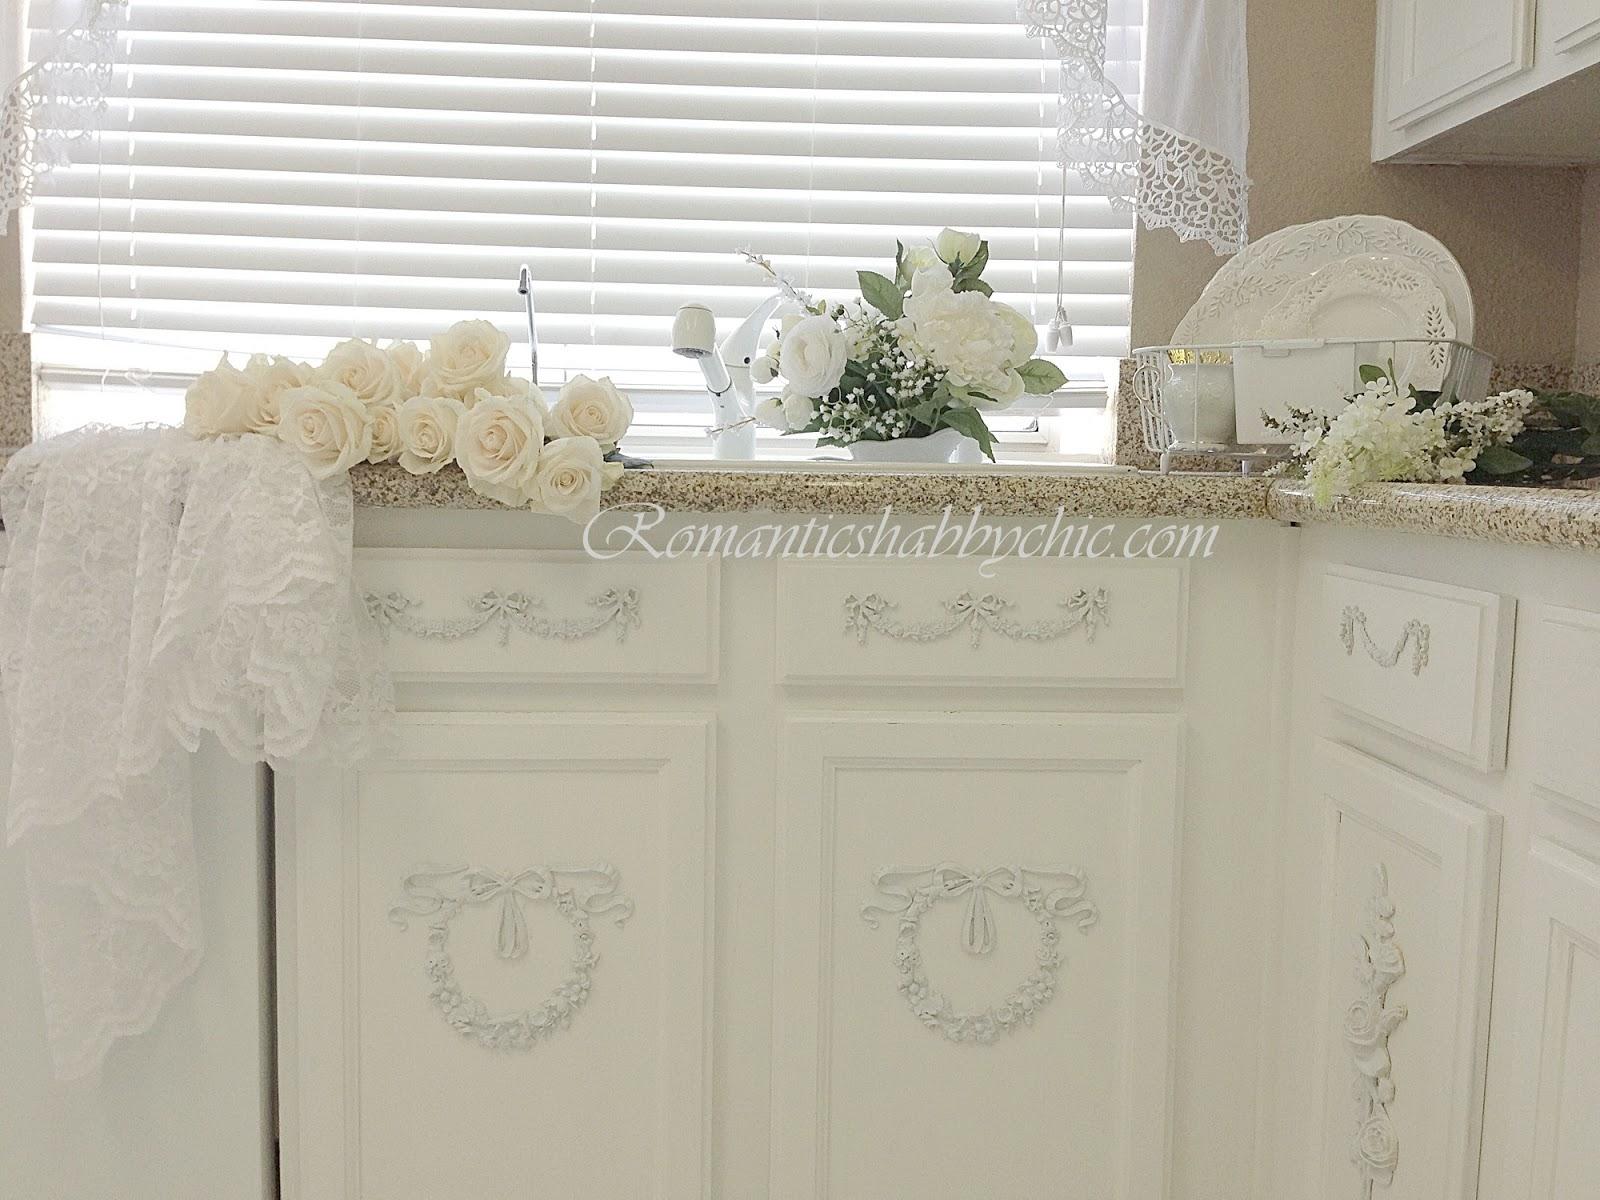 Romantic shabby chic home romantic shabby chic blog - Com Romantic Shabby Chic Kitchen Romantic White Kitchen